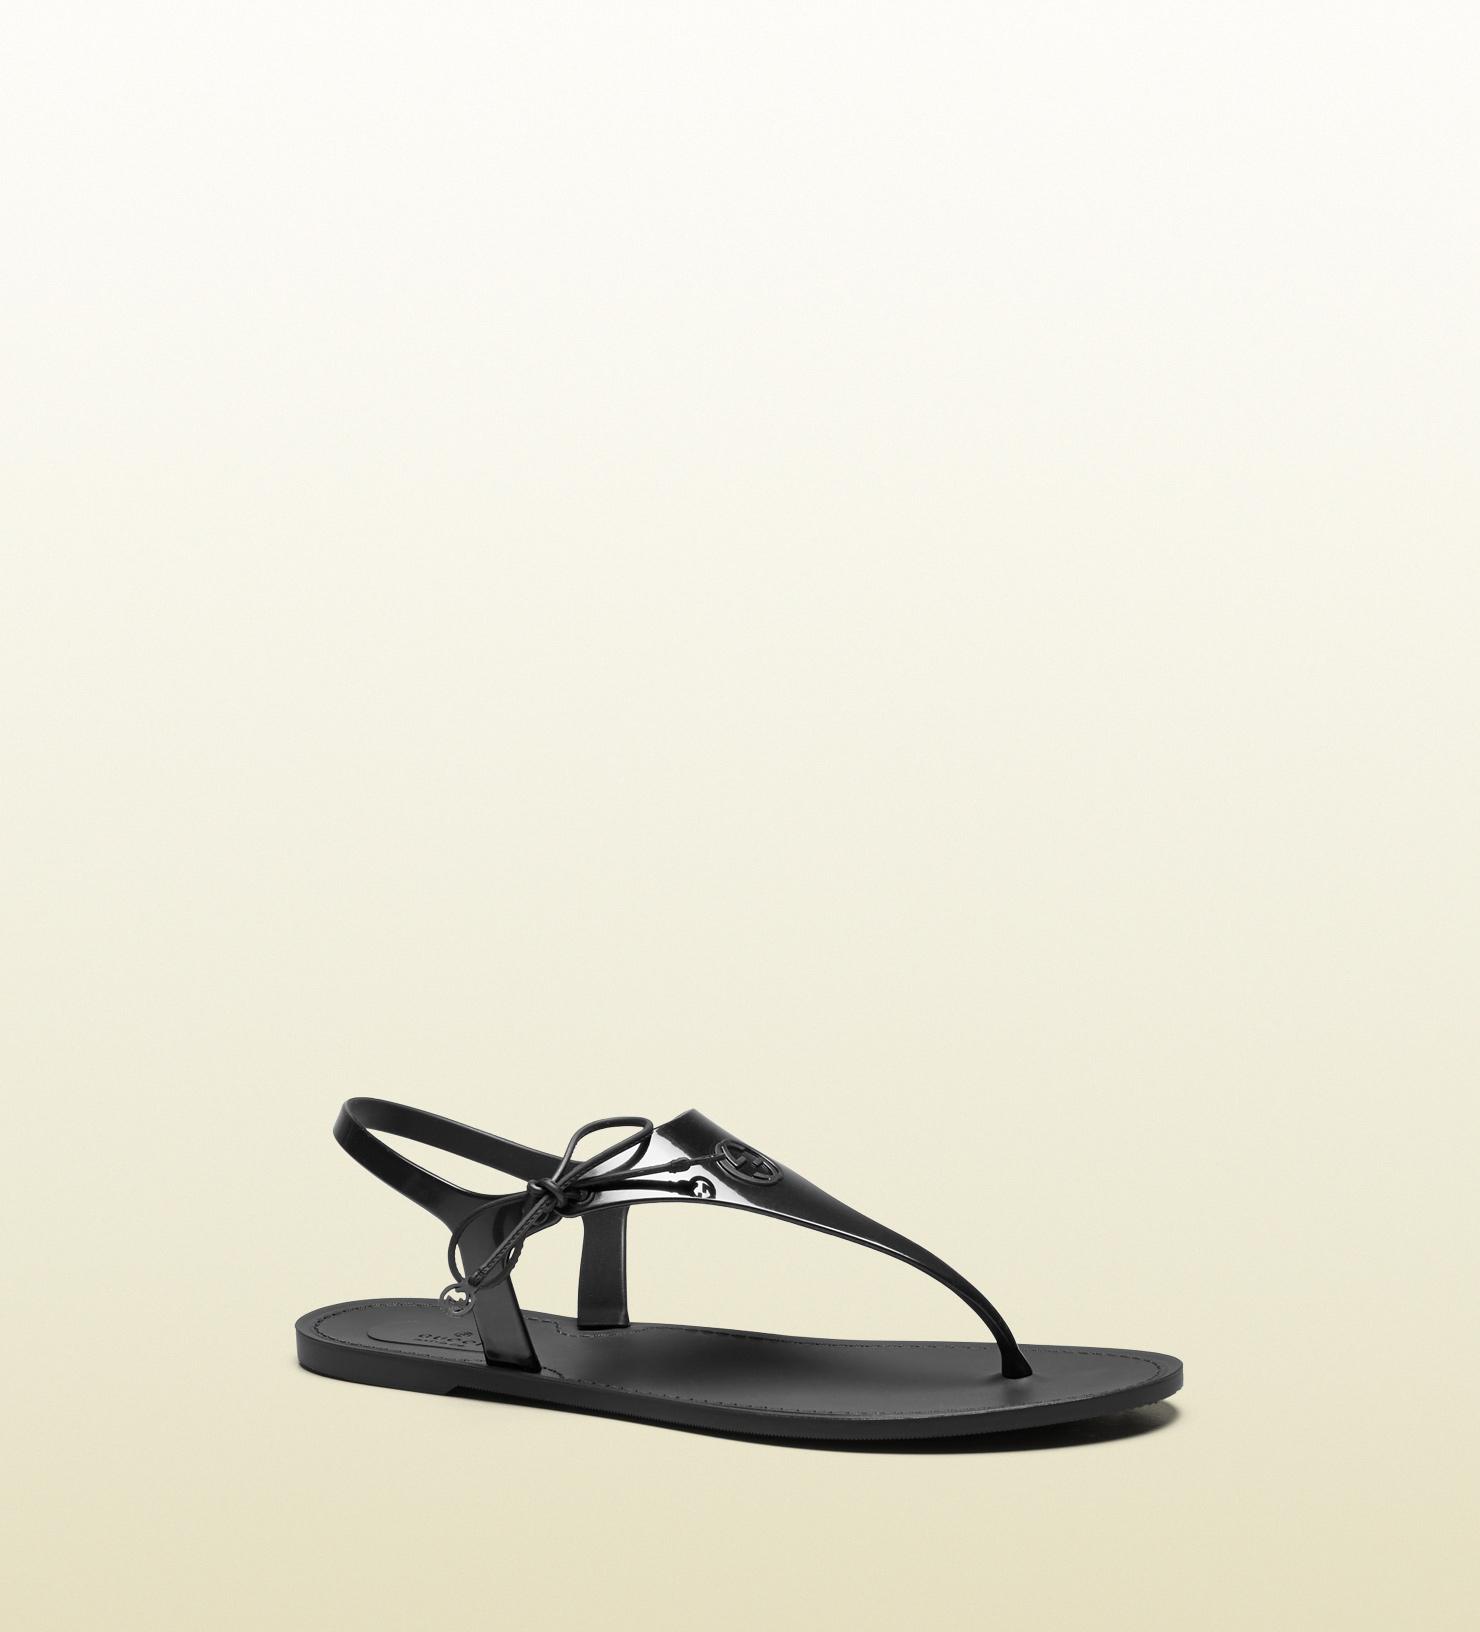 Black gucci sandals - Gallery